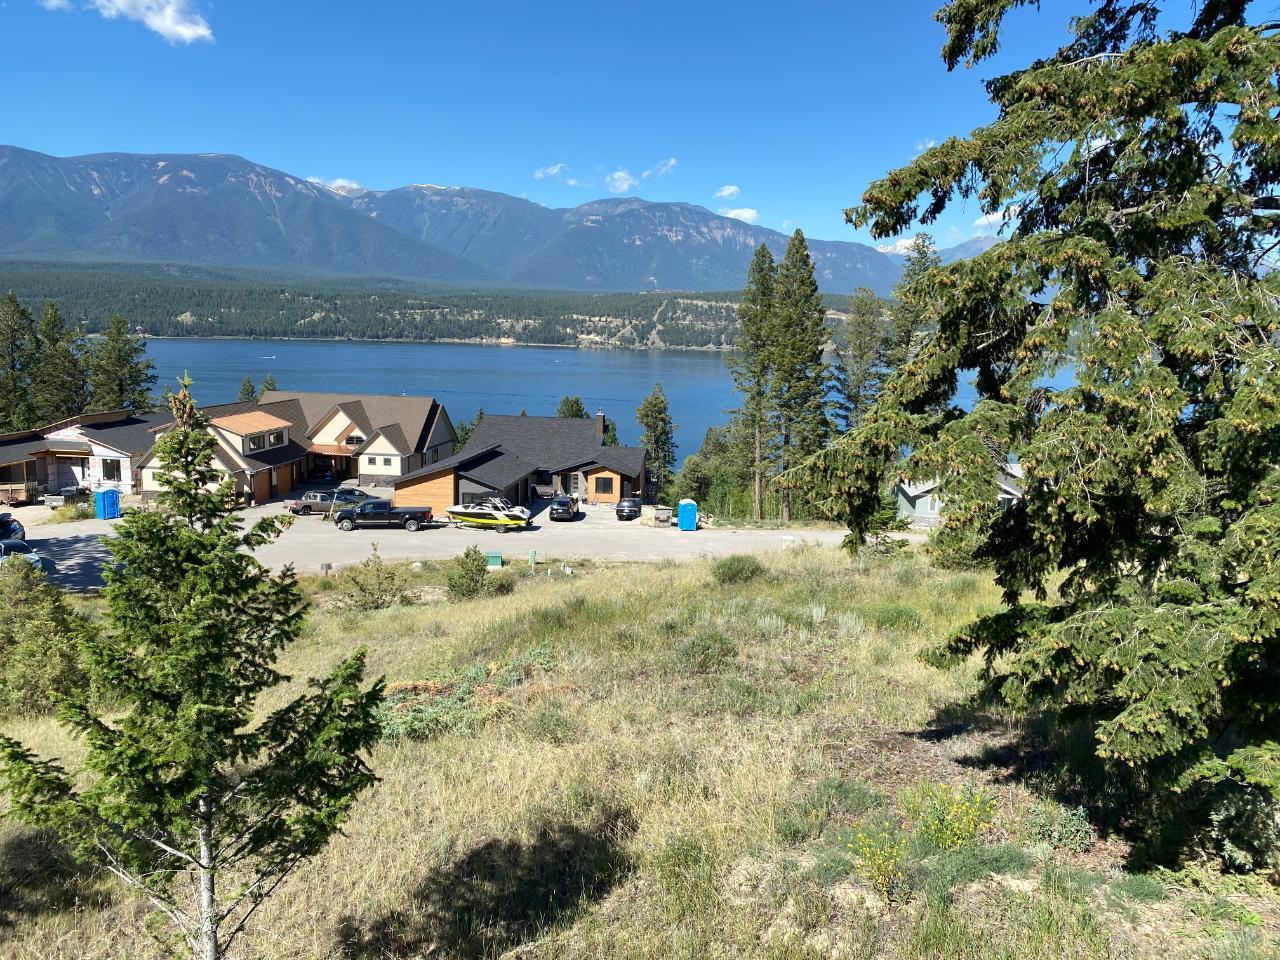 Lot 4 Stoddart Estates Drive, Windermere, British Columbia  V0B 2L0 - Photo 1 - 2451193